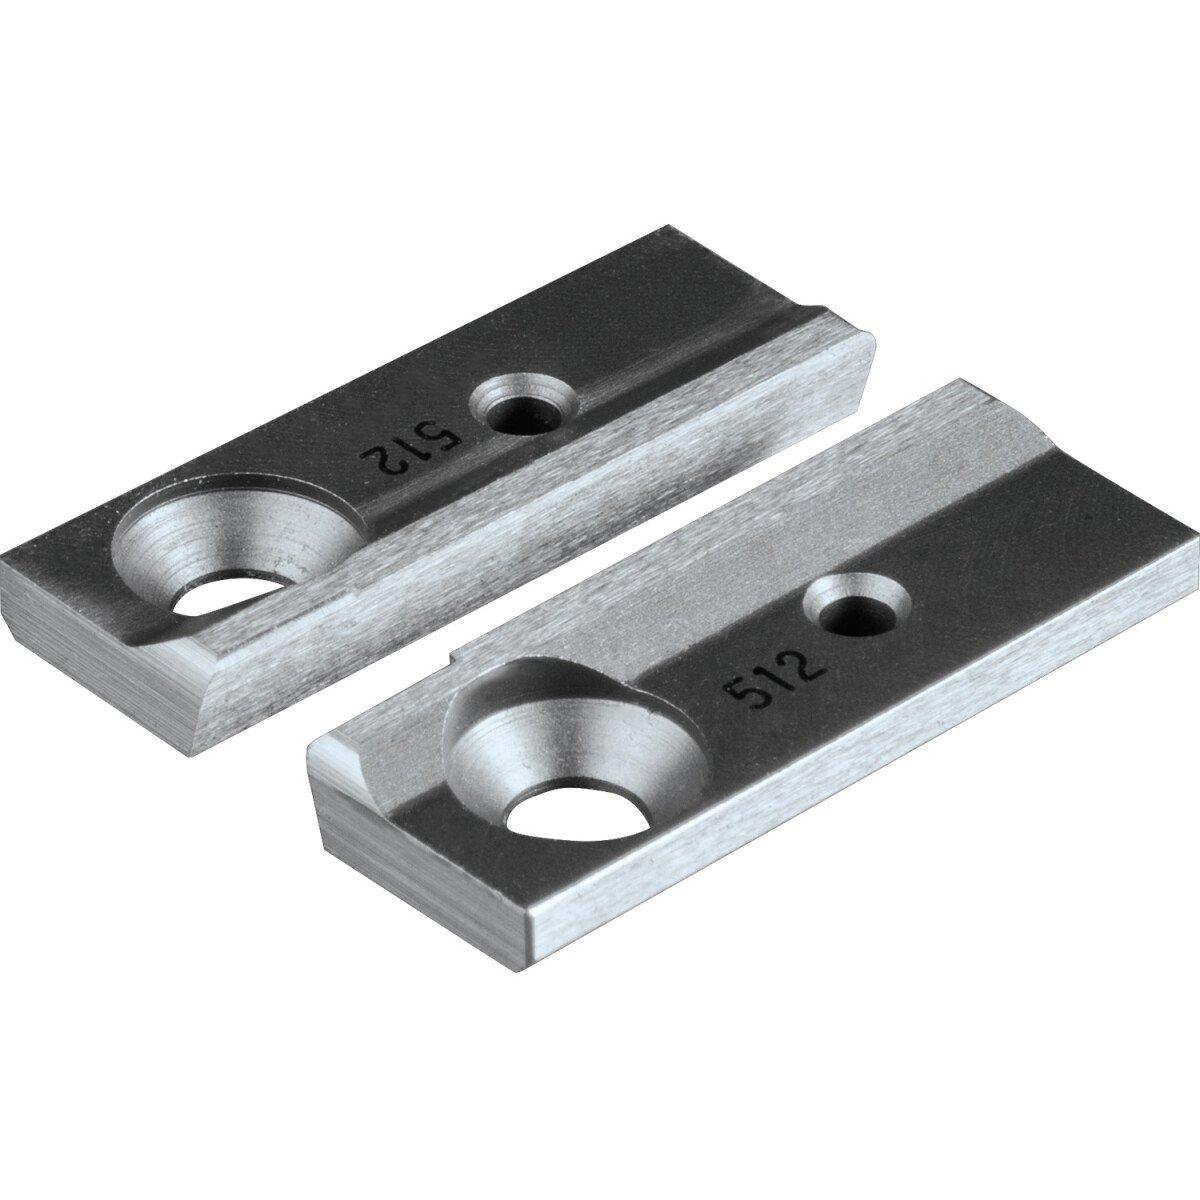 Makita 792536-0 Side Blade Set (JS1670)